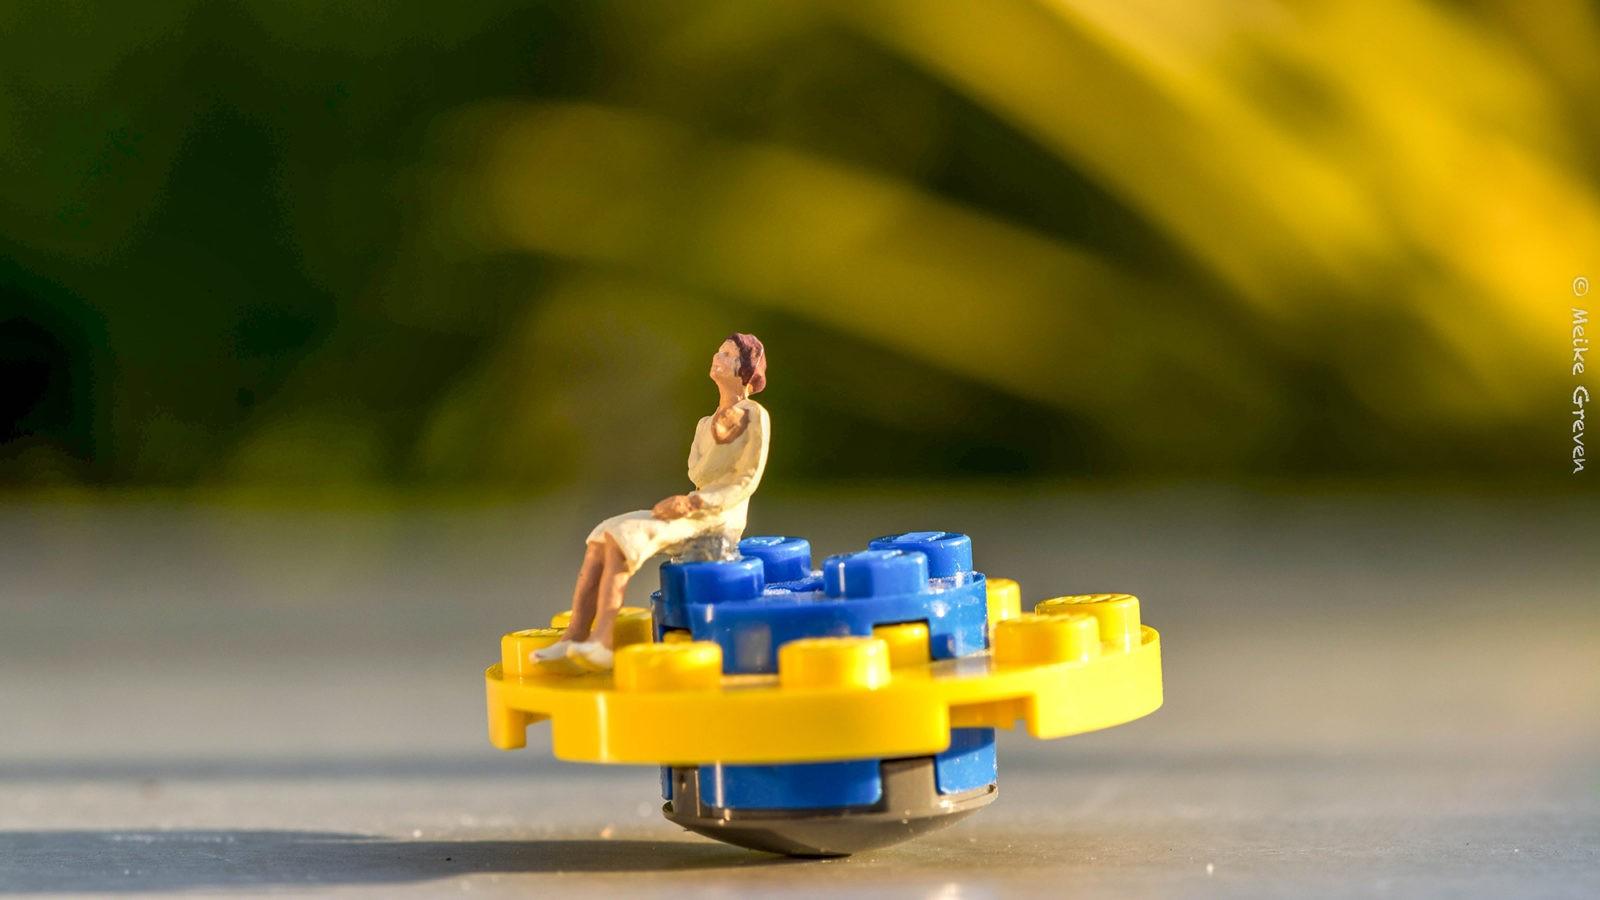 Bild zu Jobcoaching, Berufsberatung, Begabungsanalyse, Coaching